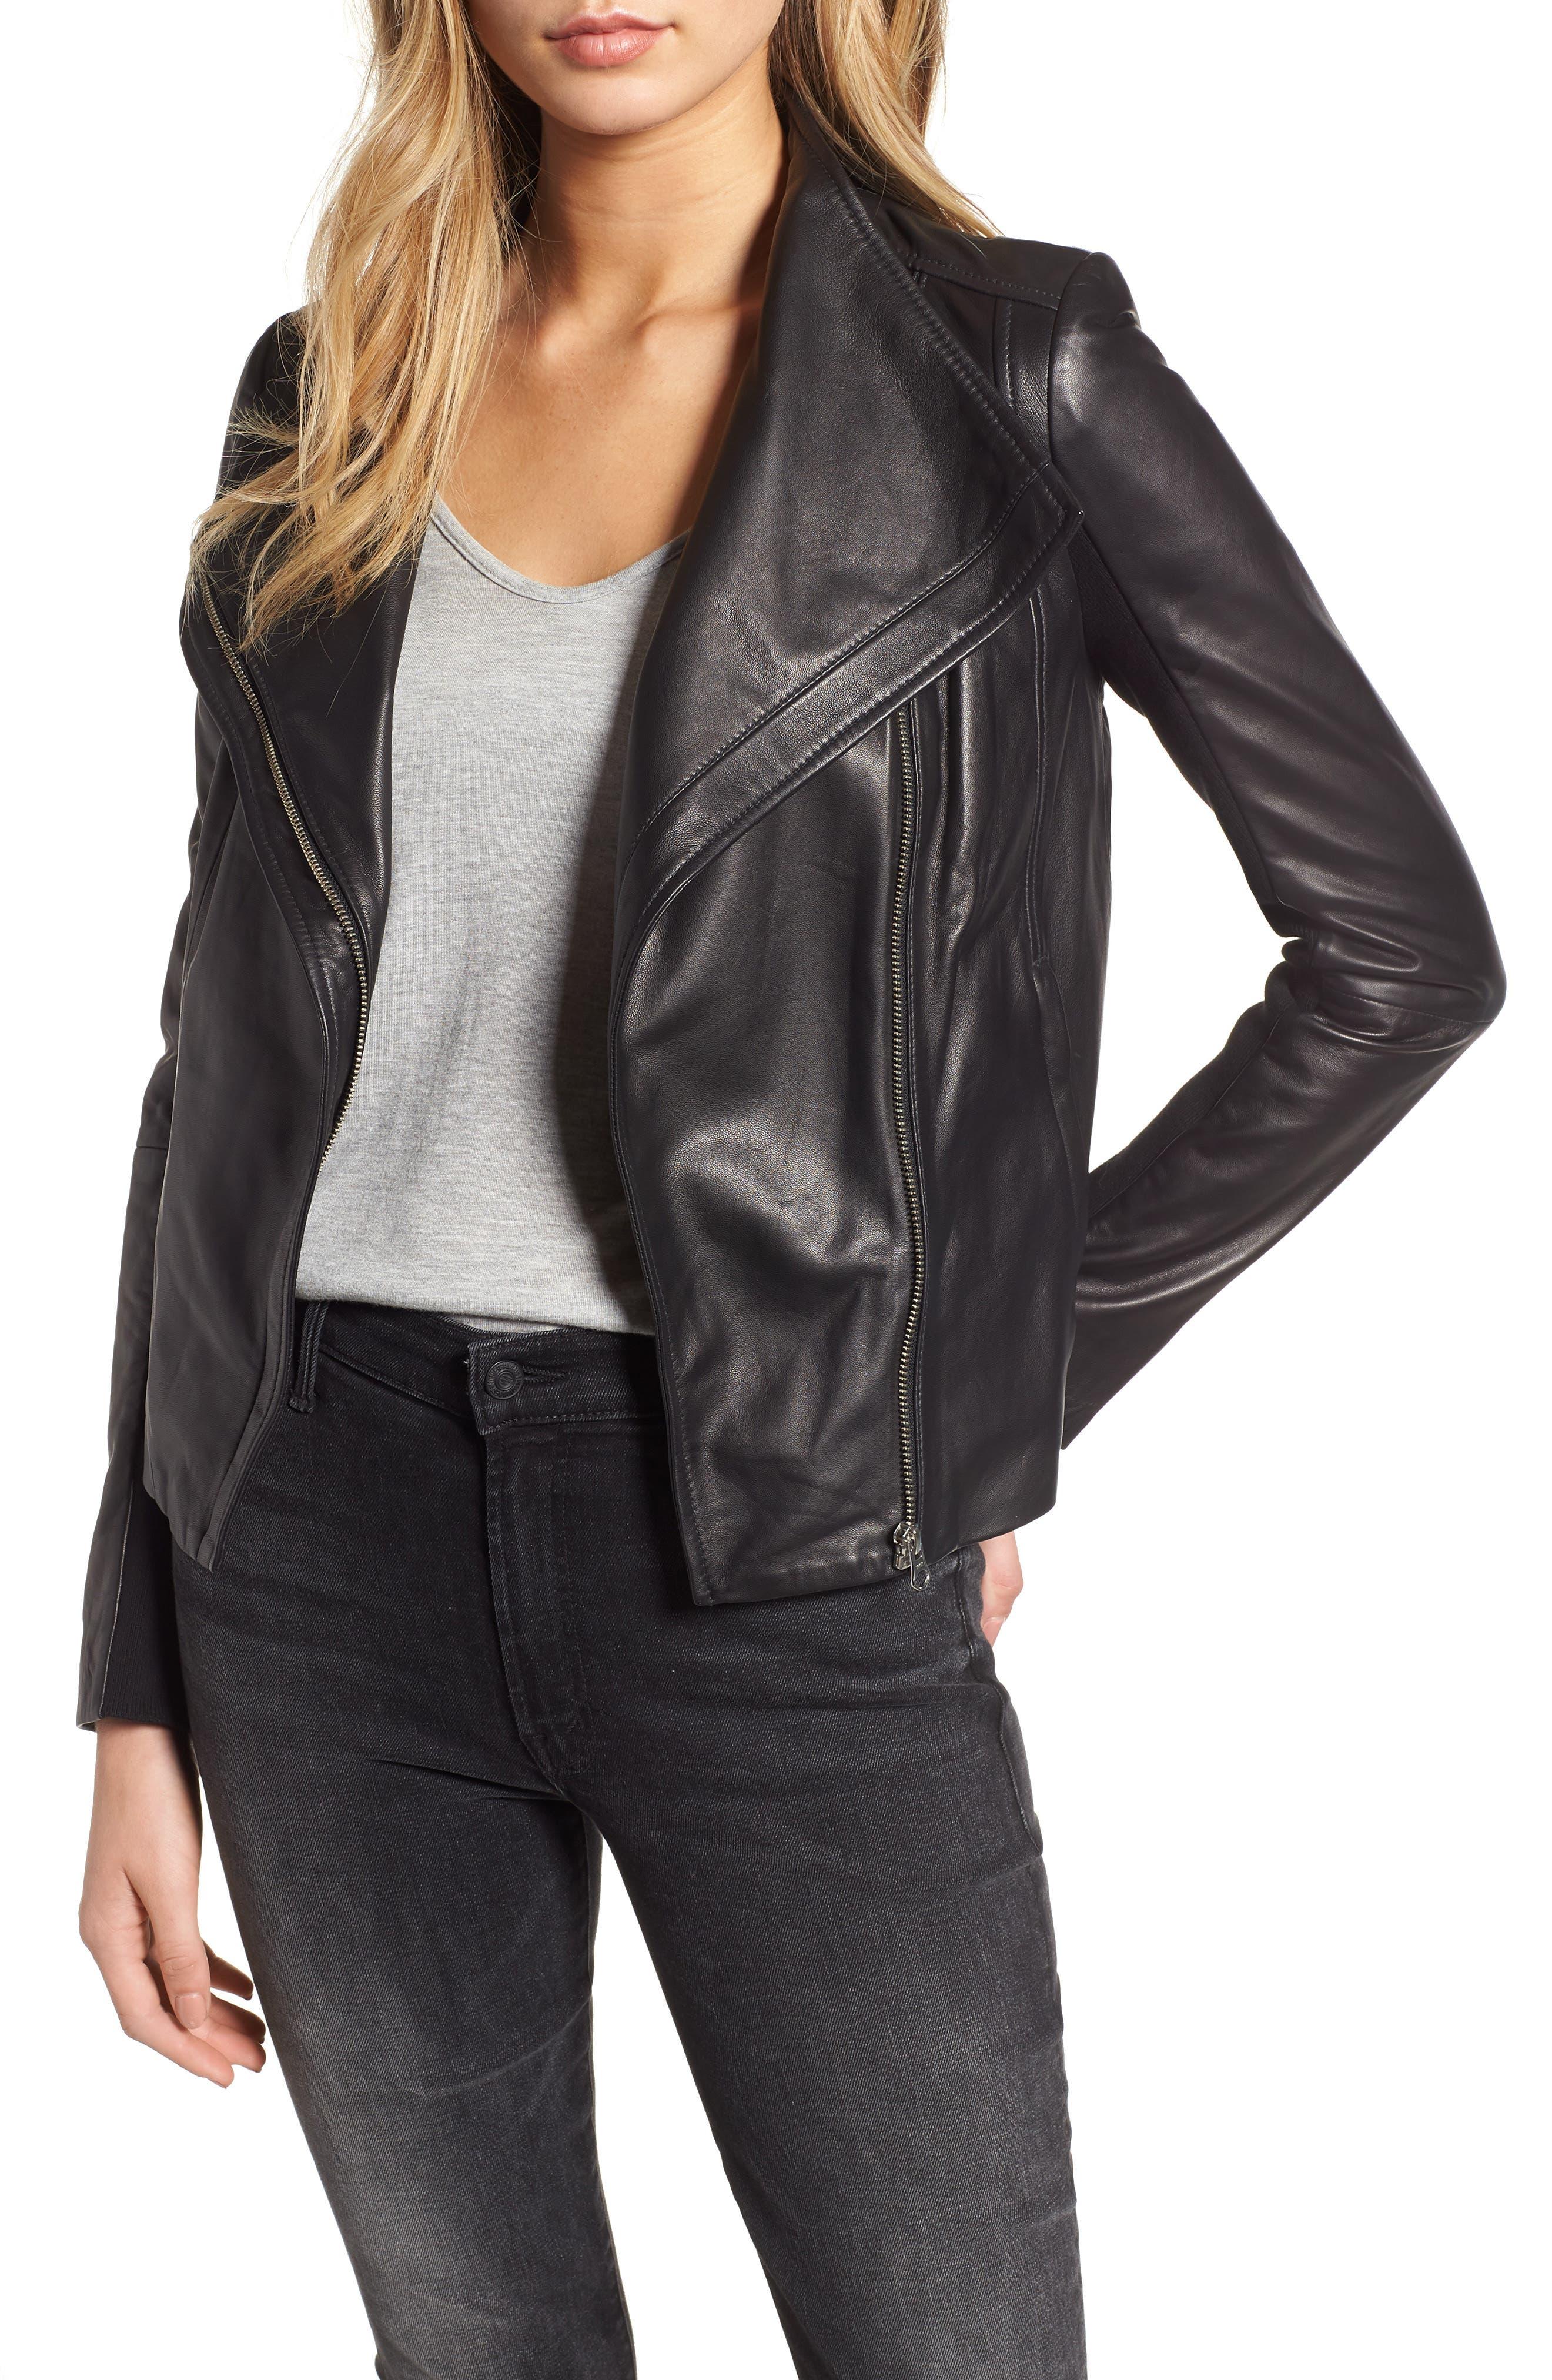 80s Windbreakers, Jackets, Coats Womens Chelsea28 Leather Moto Jacket Size Medium - Black $299.00 AT vintagedancer.com